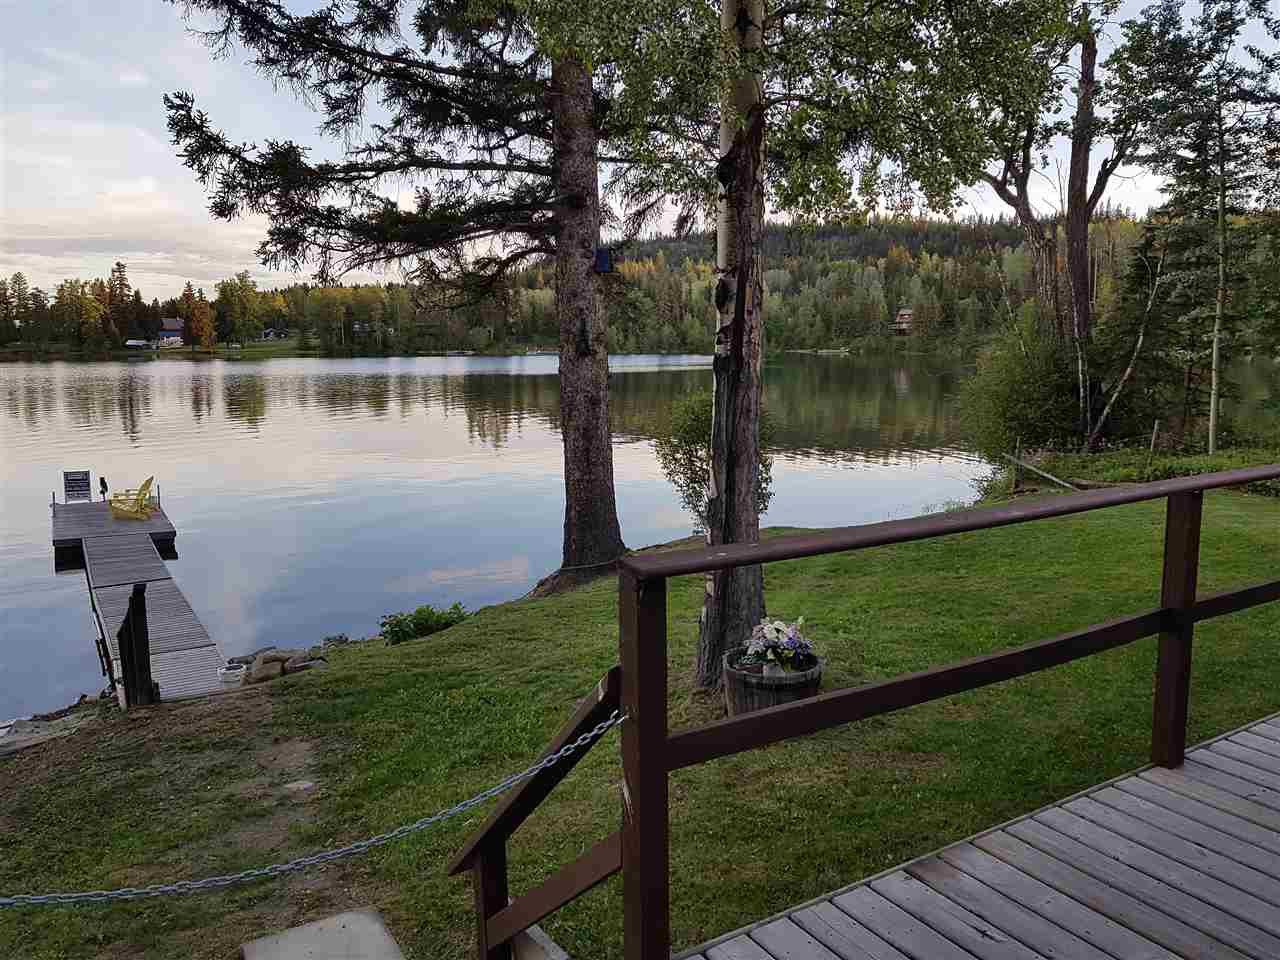 Photo 4: Photos: 7898 DEAN Road in Bridge Lake: Bridge Lake/Sheridan Lake House for sale (100 Mile House (Zone 10))  : MLS®# R2274404